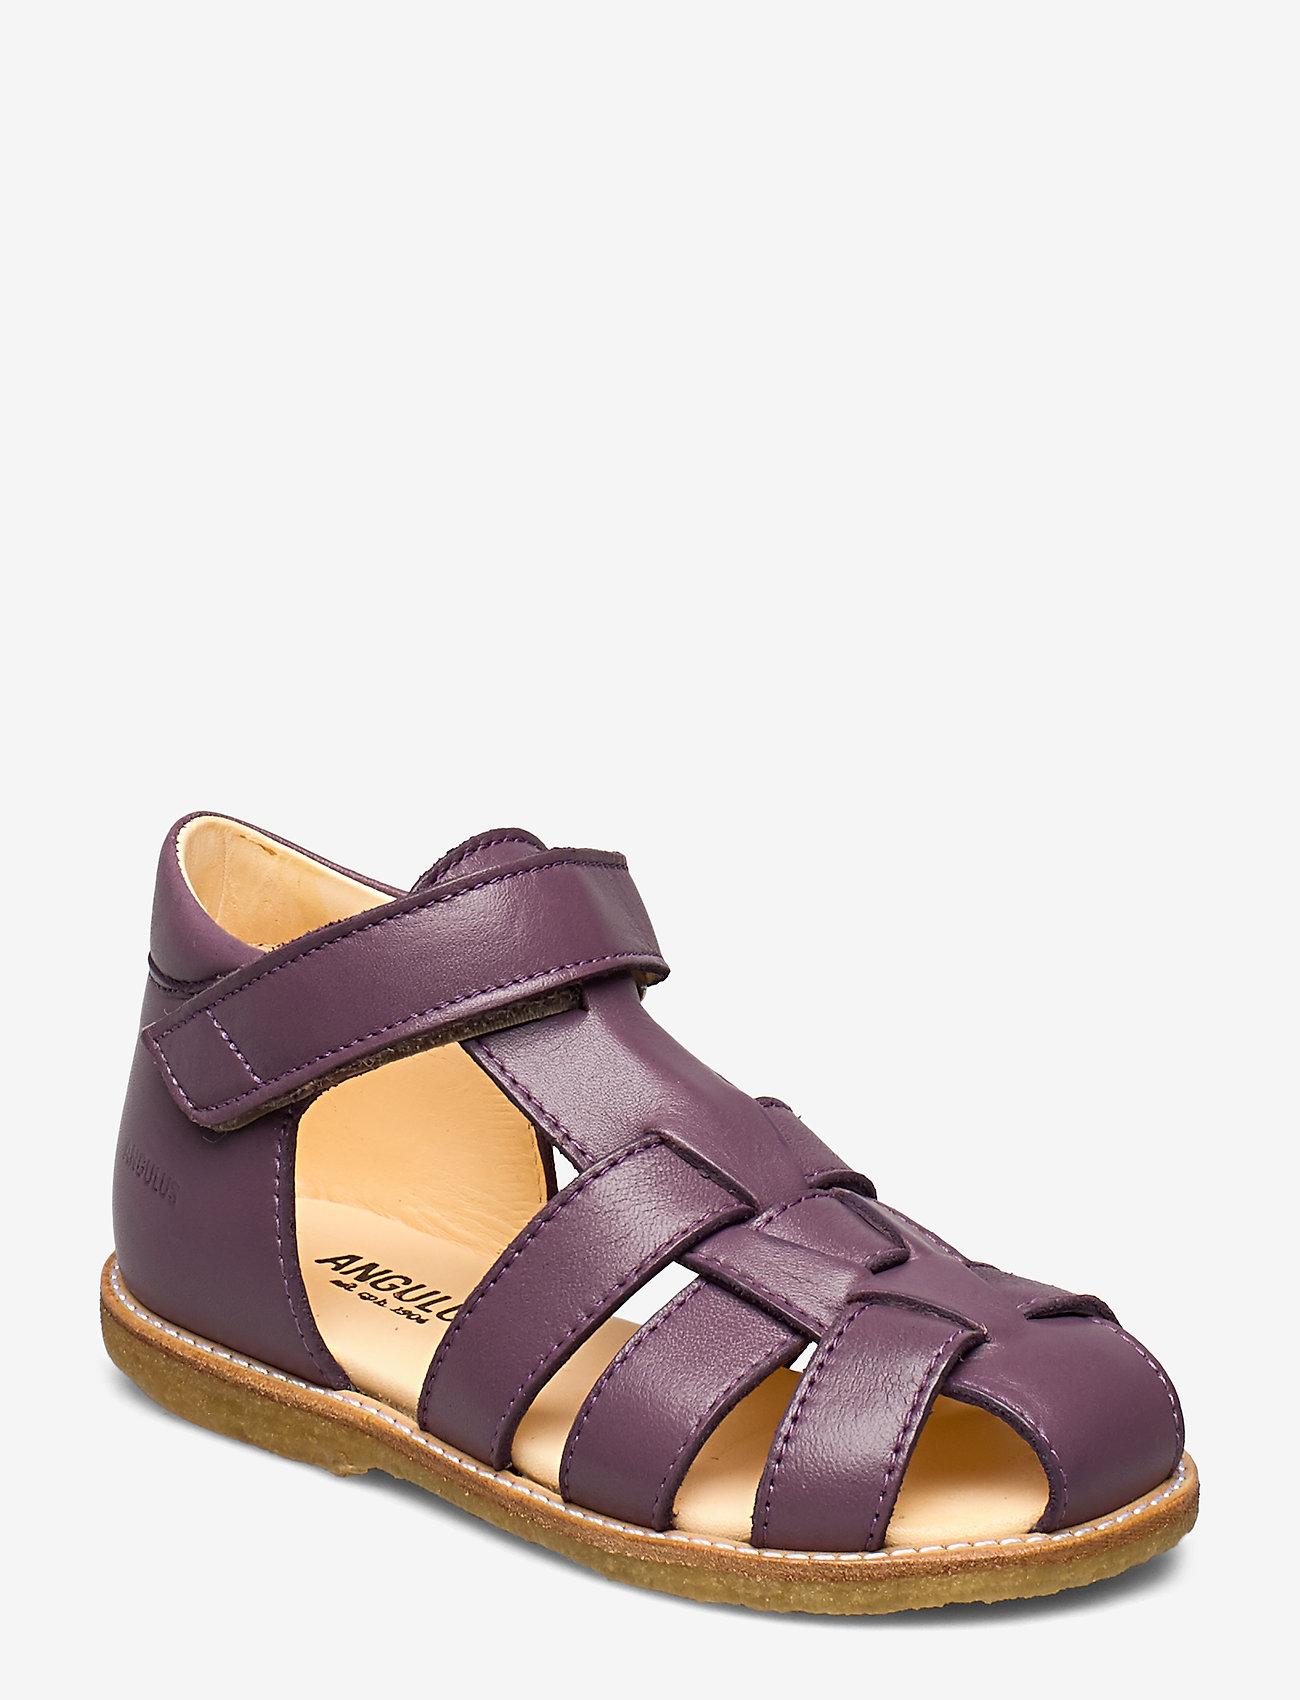 ANGULUS - Sandals - flat - closed toe -  - sandały z paskiem - 1568 lavender - 0